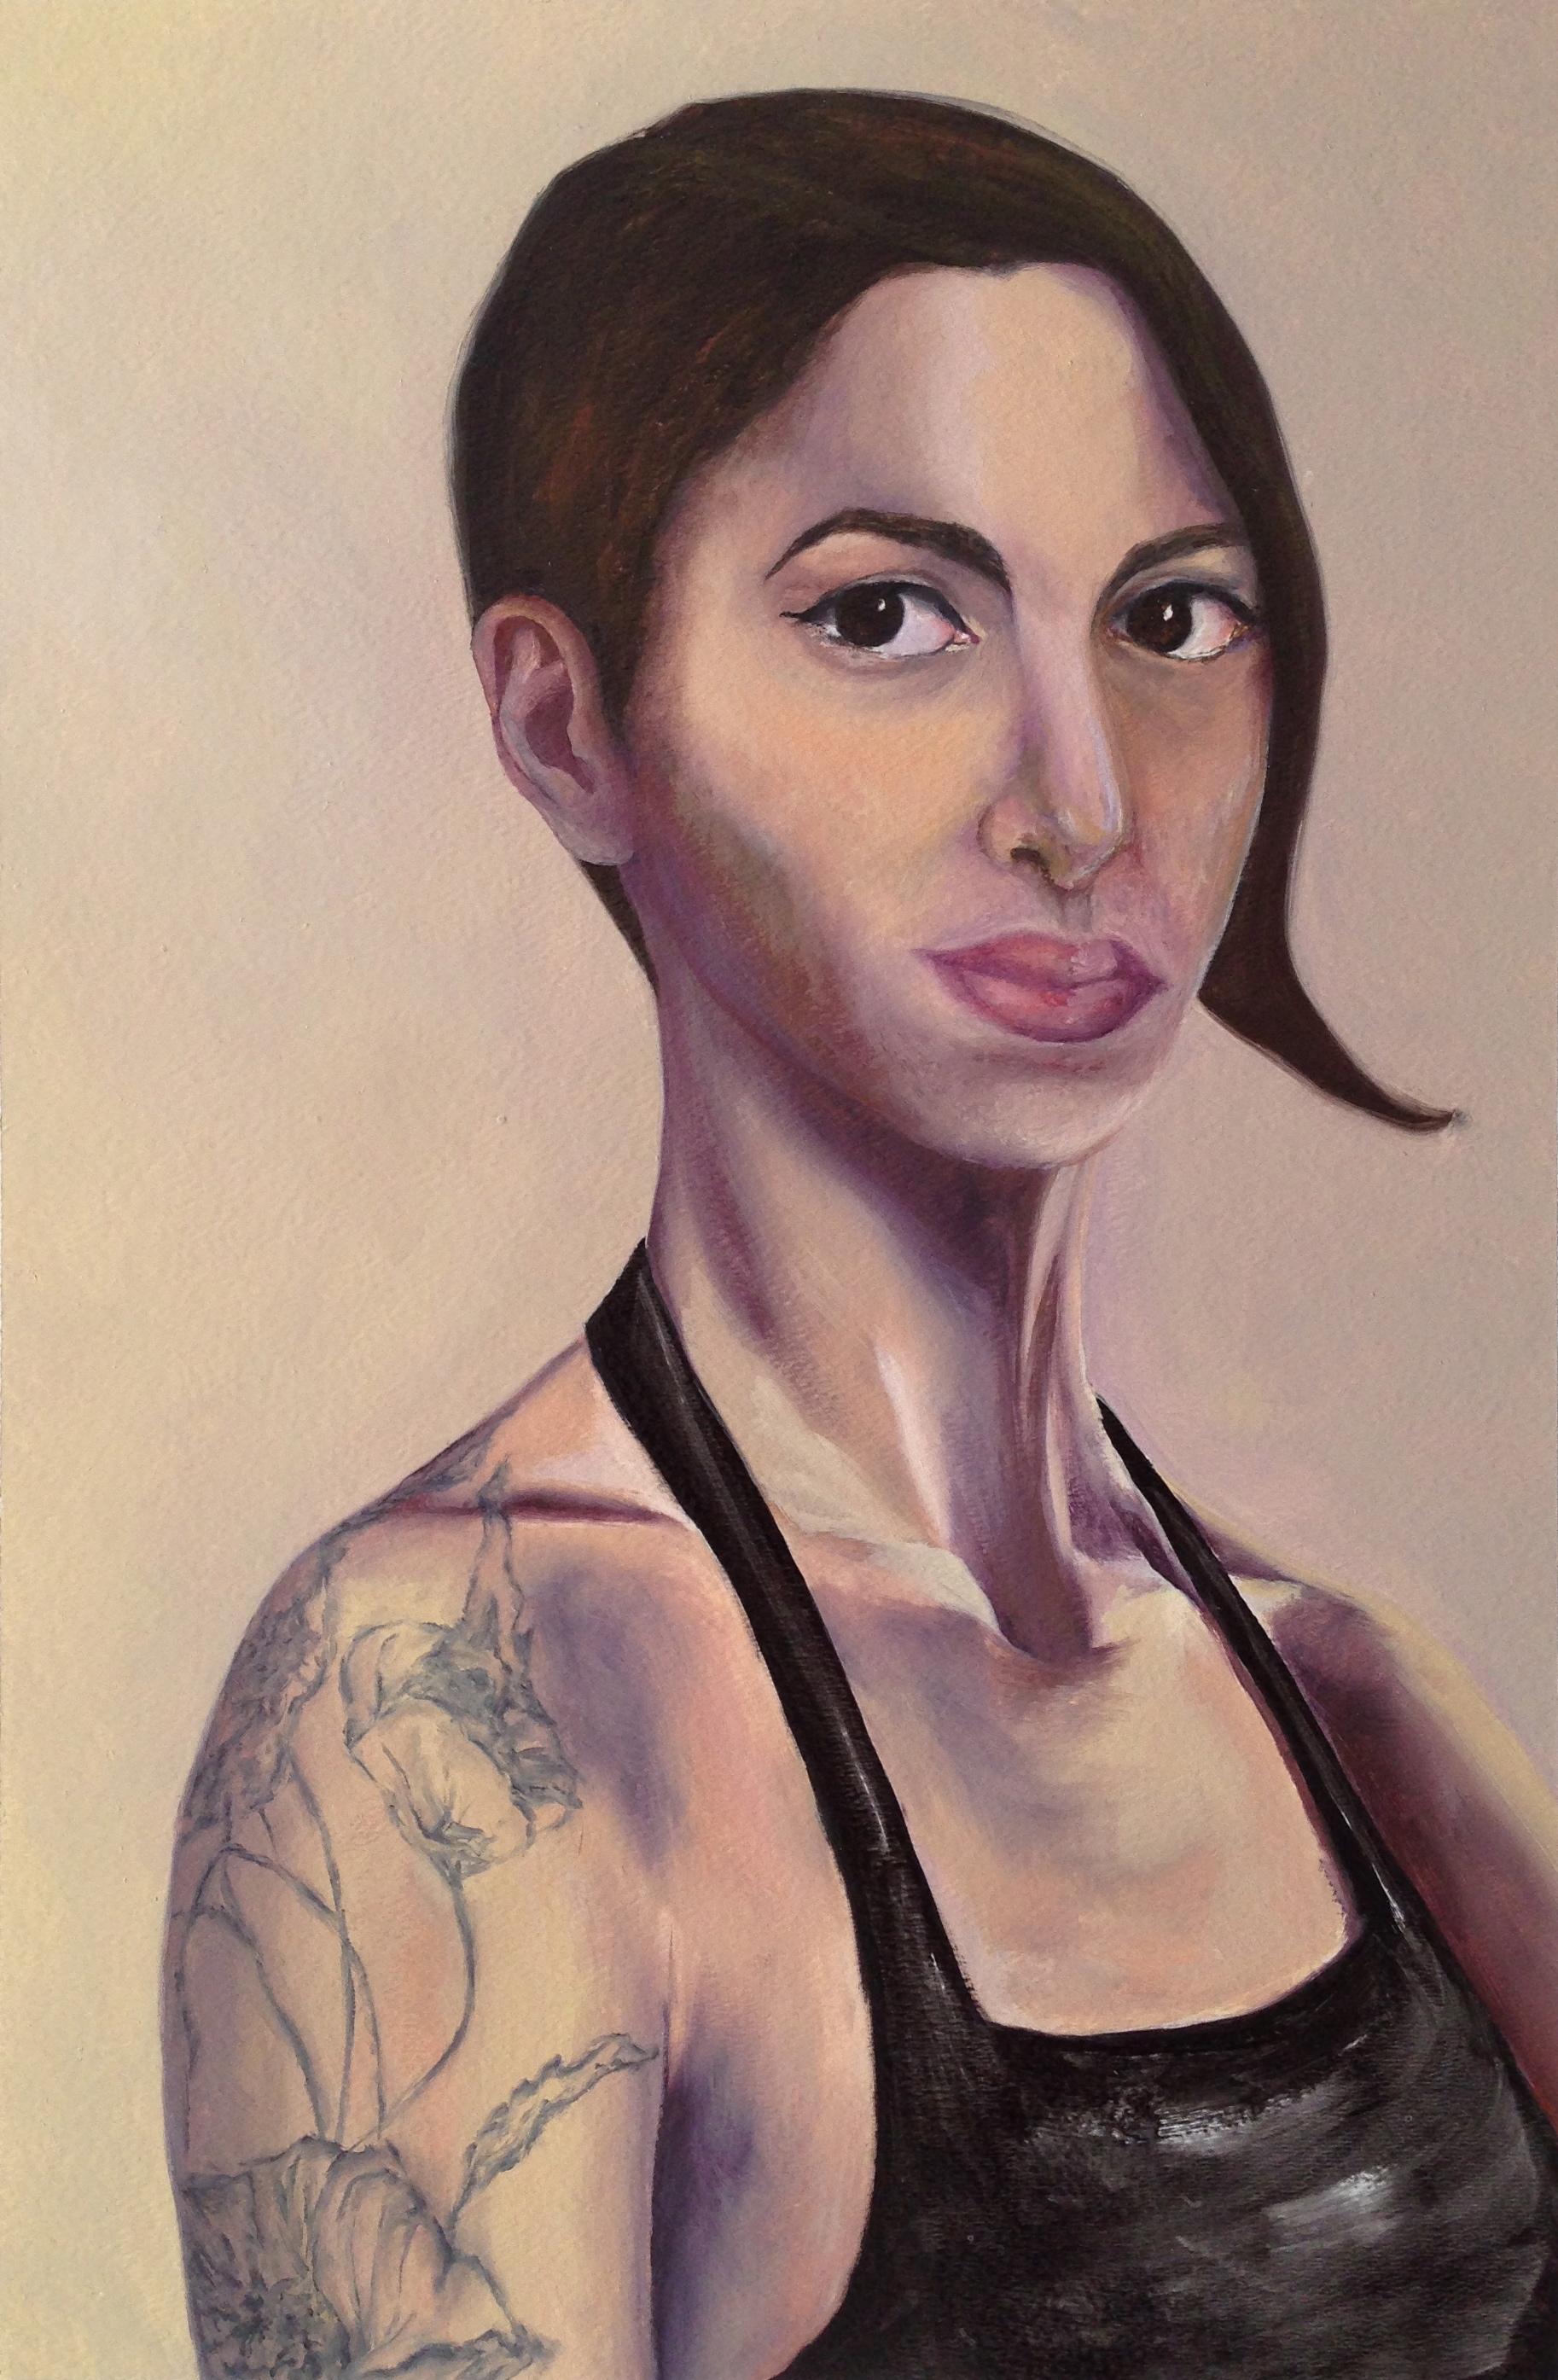 Self Portrait with Tattoo